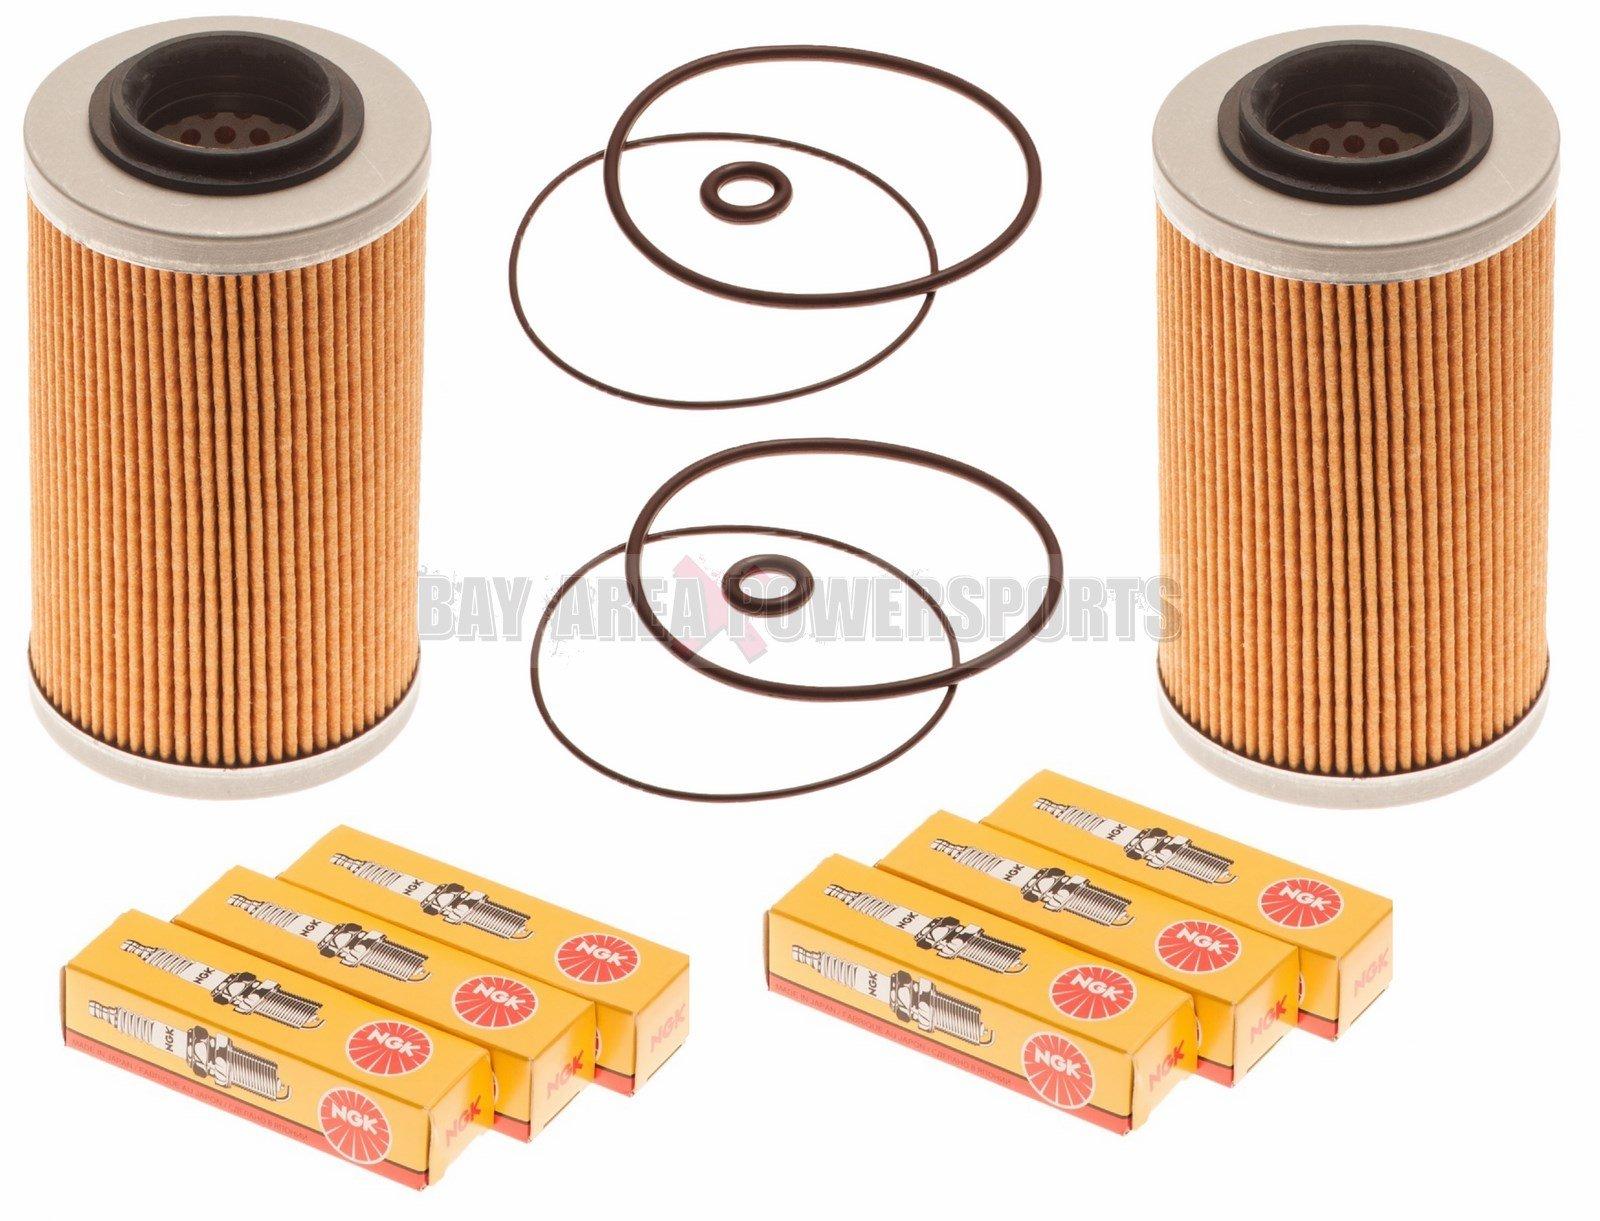 Sea Doo 4-Tec Maintenance Kit Oil Filter W/ O-Ring & NGK Spark Plugs 2 Pack